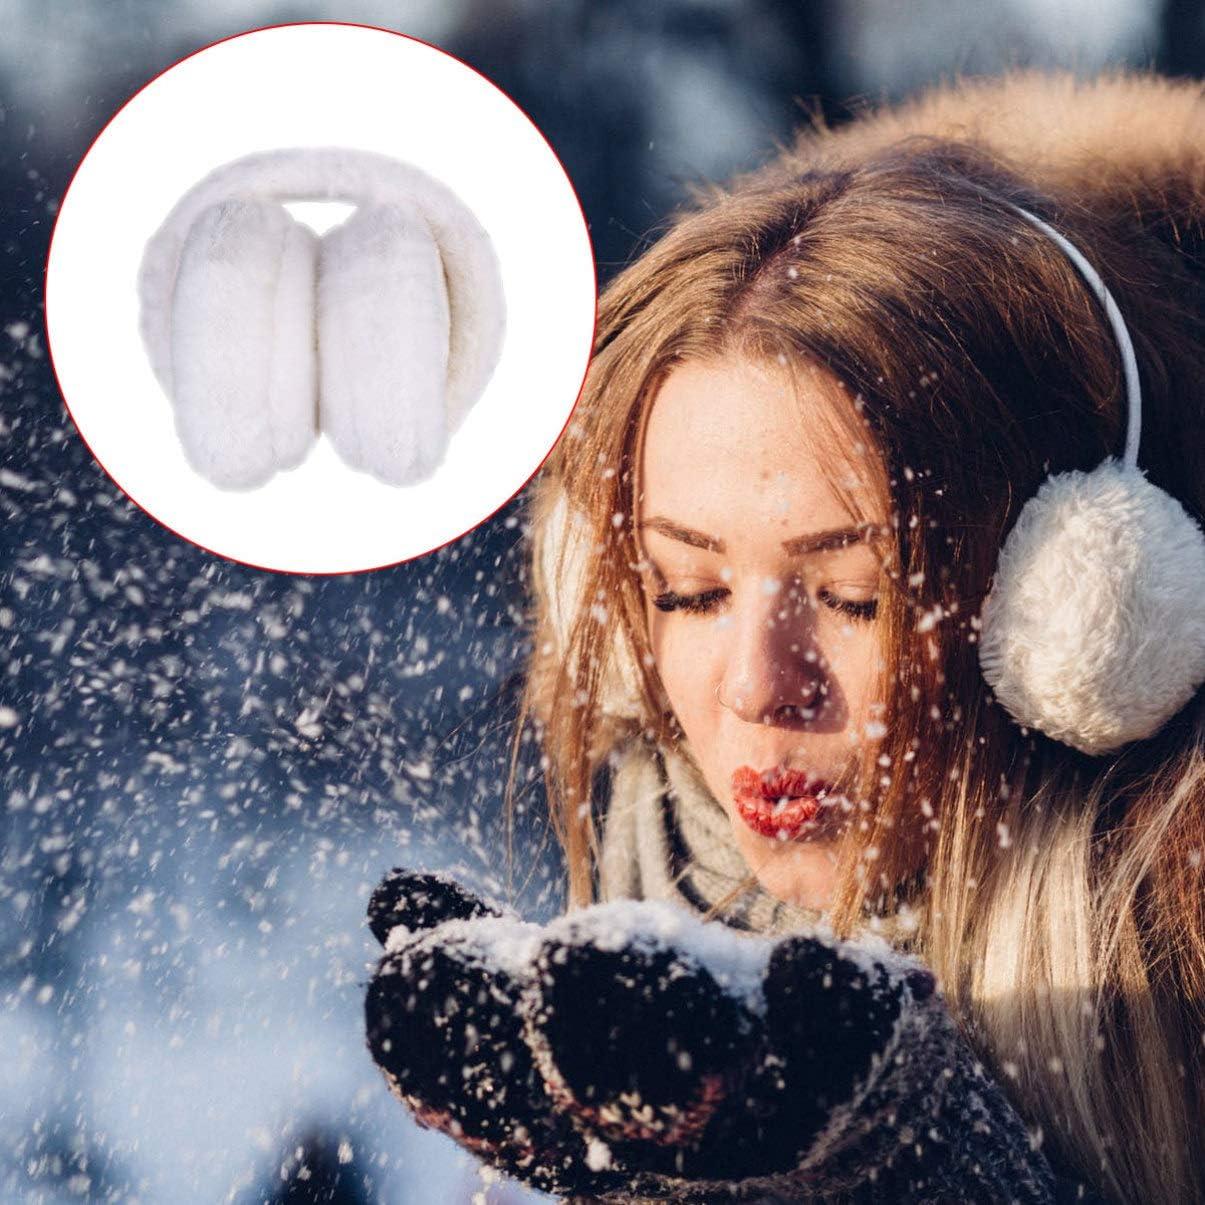 Healifty Winter Ear Muffs Unisex Earwarmer Outdoor Earmuffs for Sports Personal Care 1PC White